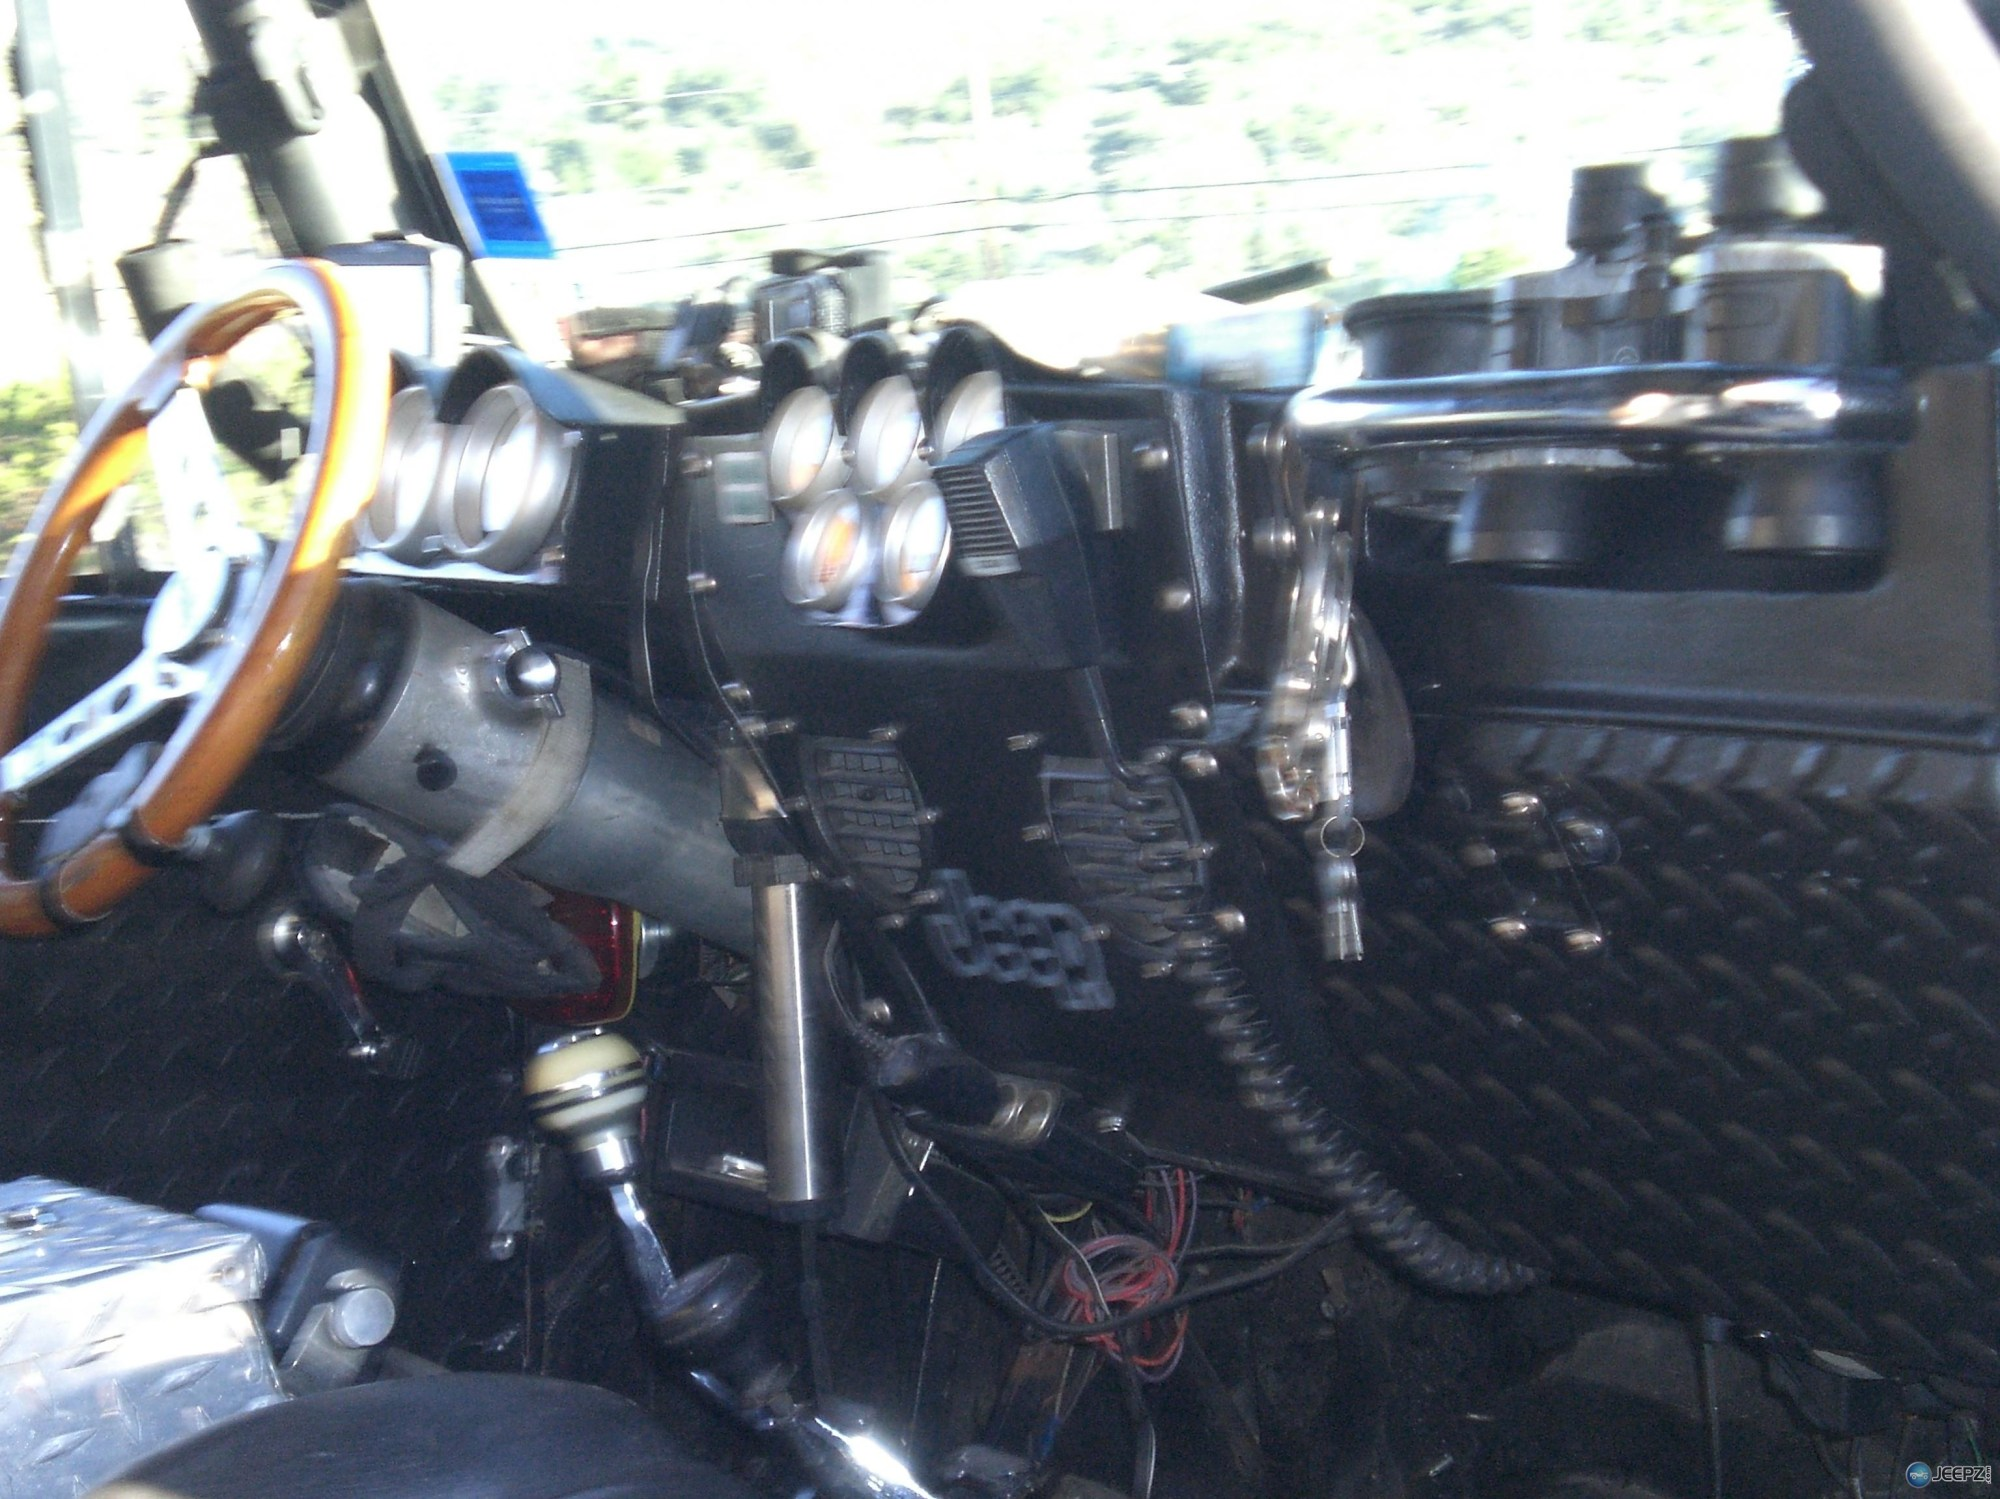 hight resolution of 85 cj7 temperature gauge problem jeep pics 006 jpg